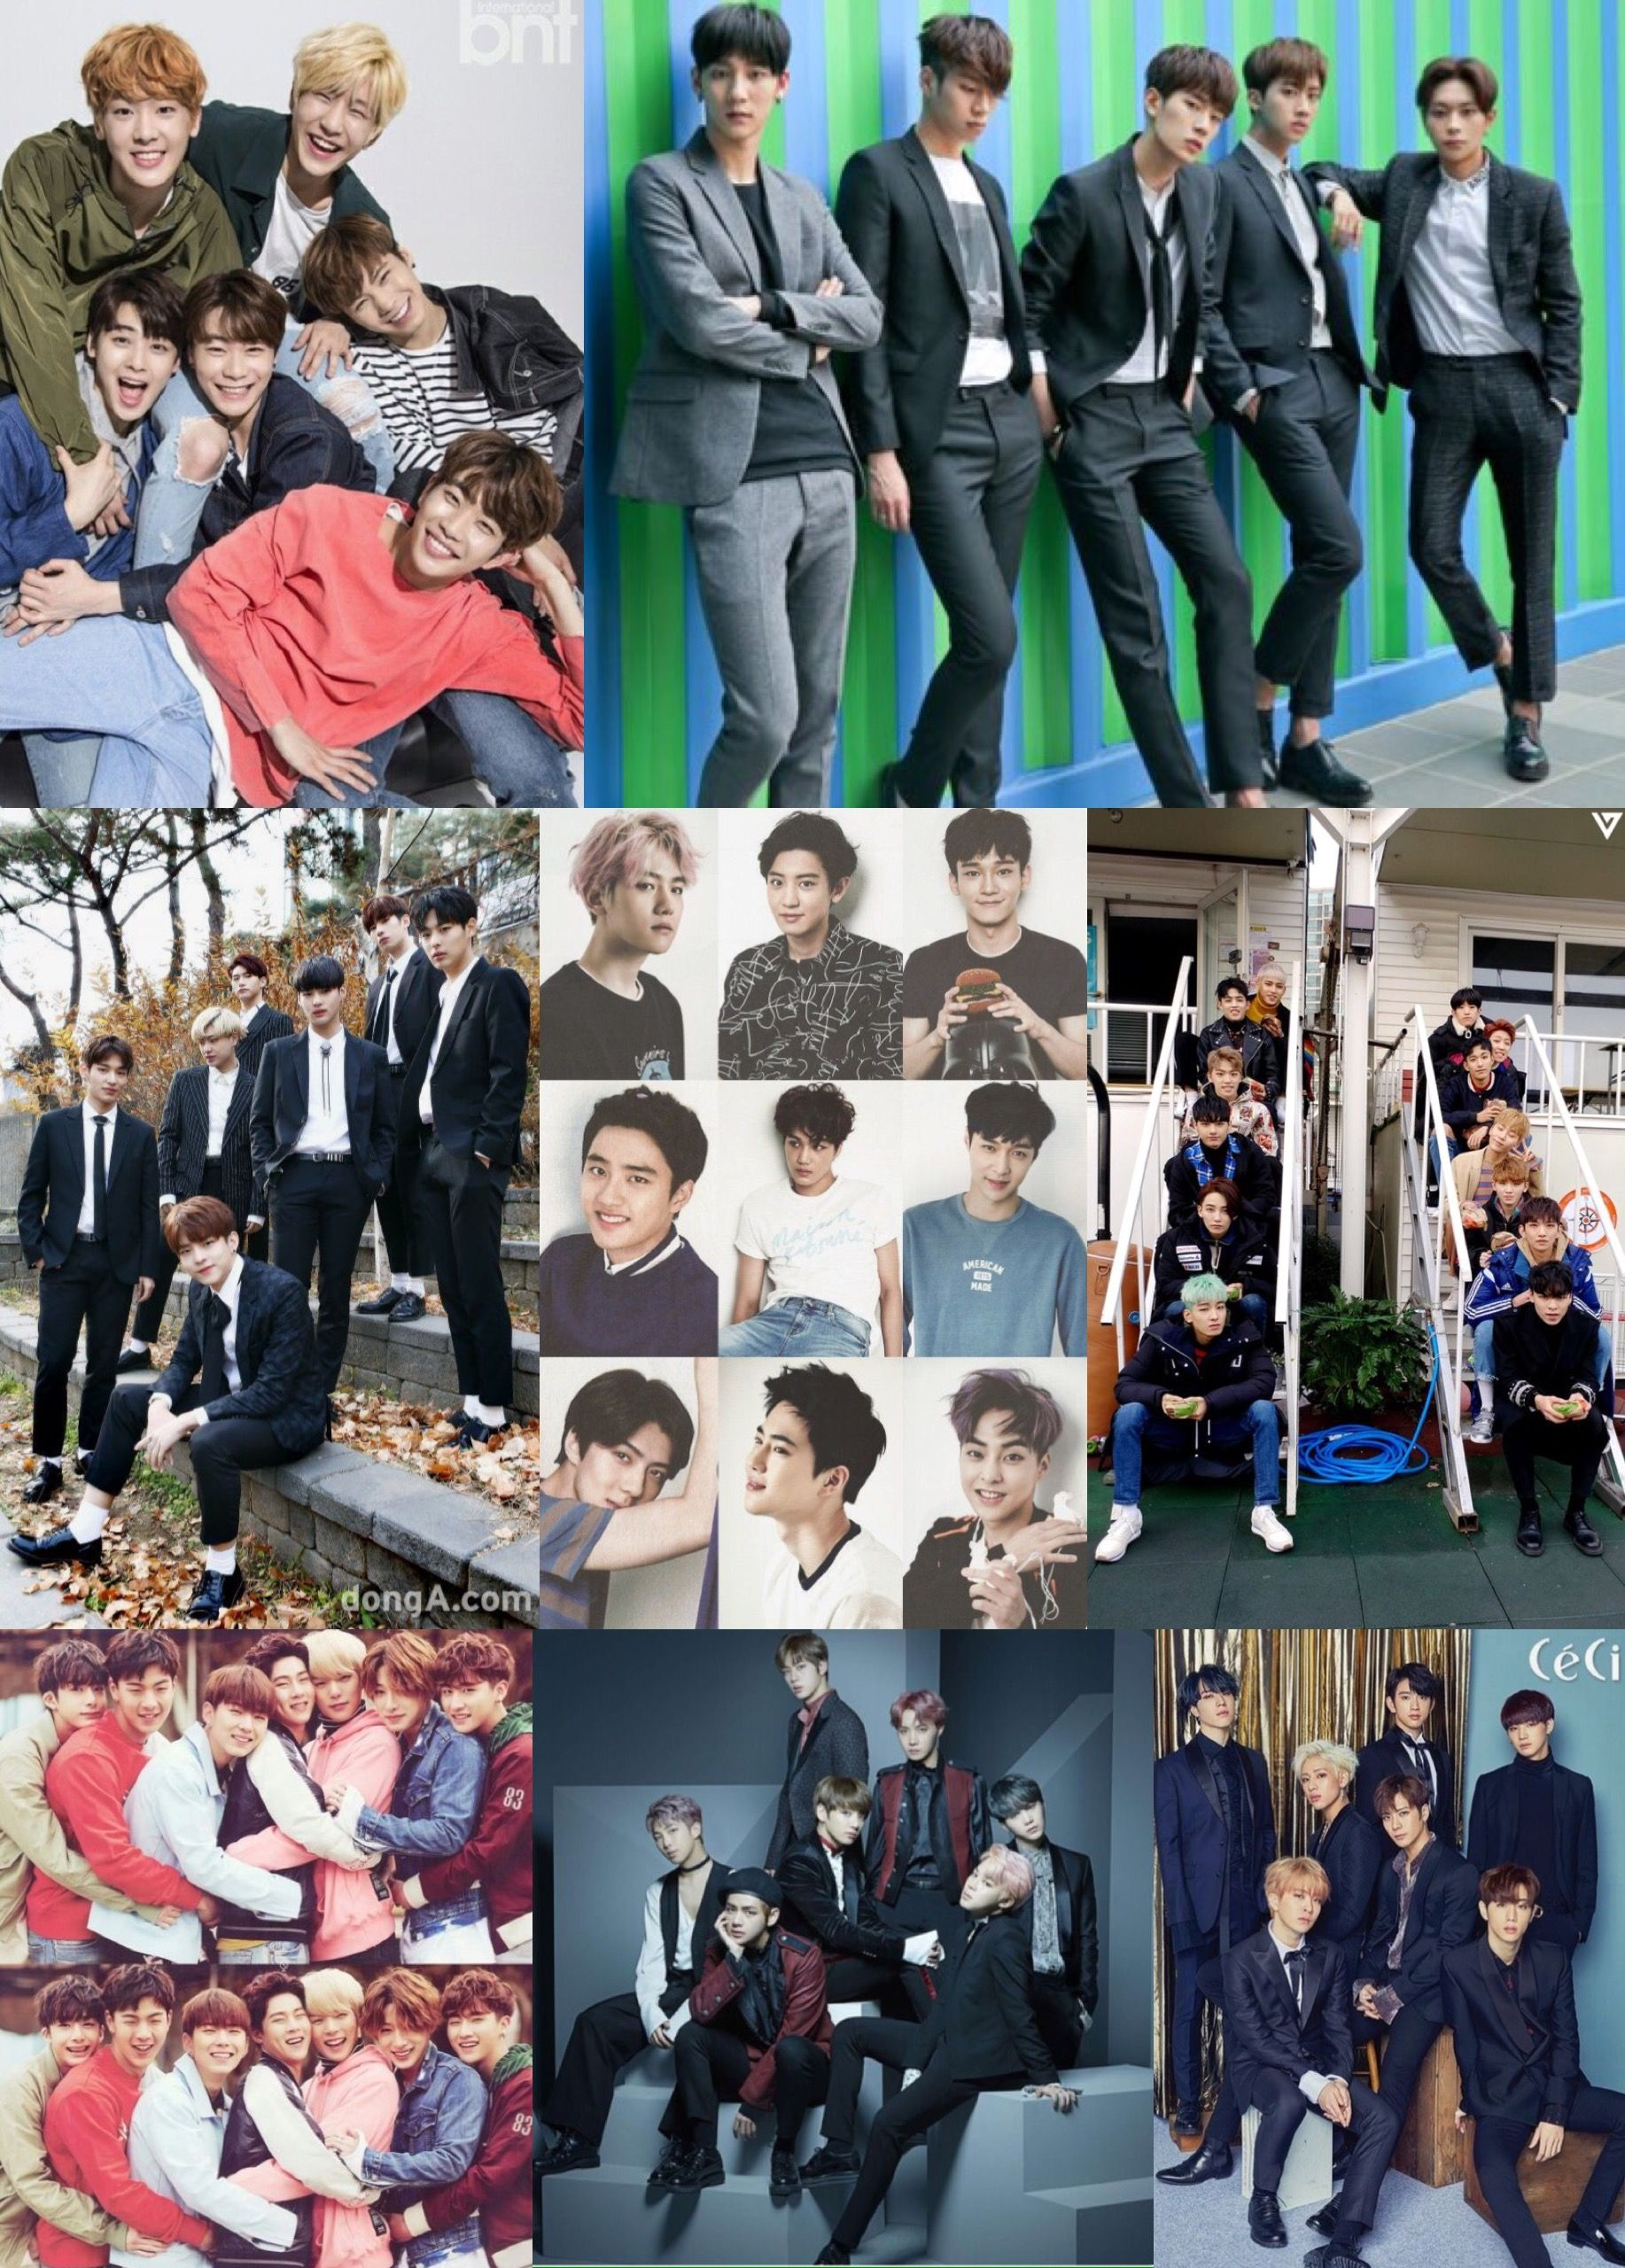 100 Wallpaper Bts Got7 HD Terbaik